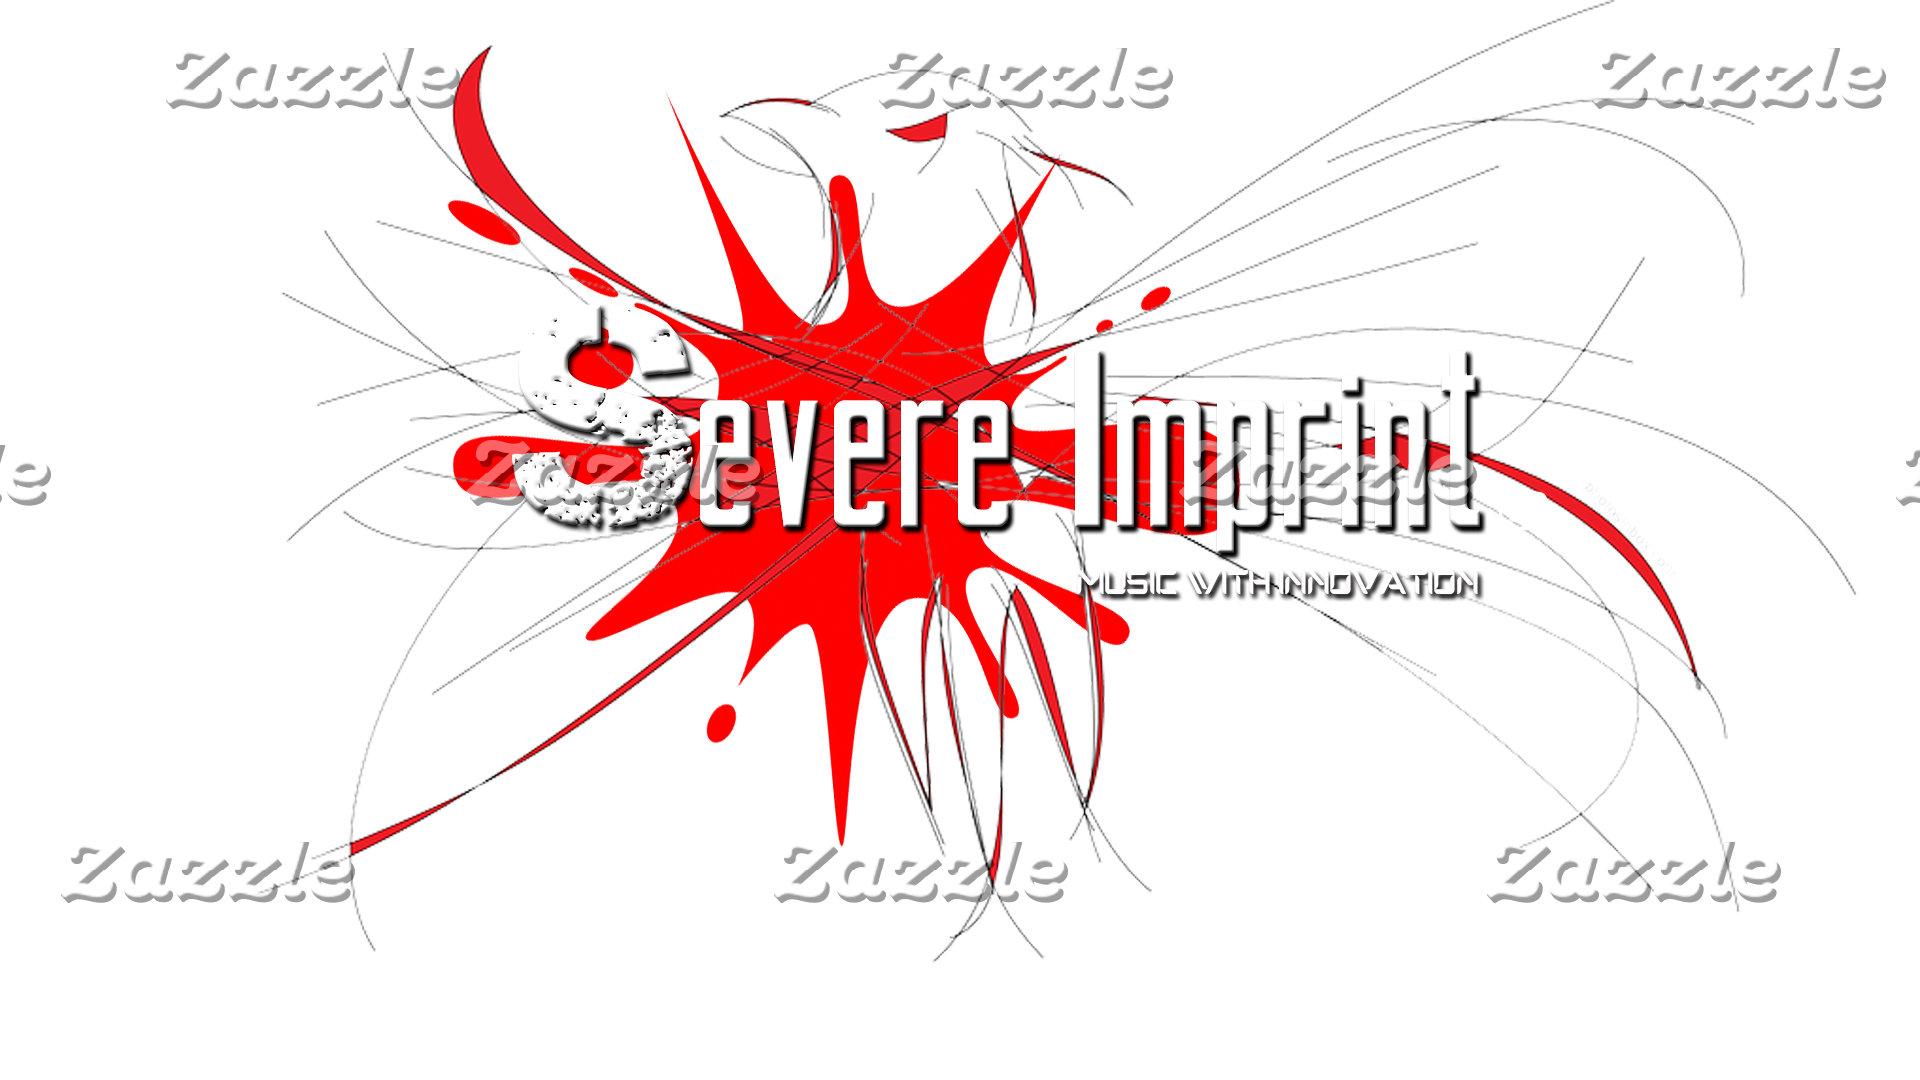 Severe Imprint